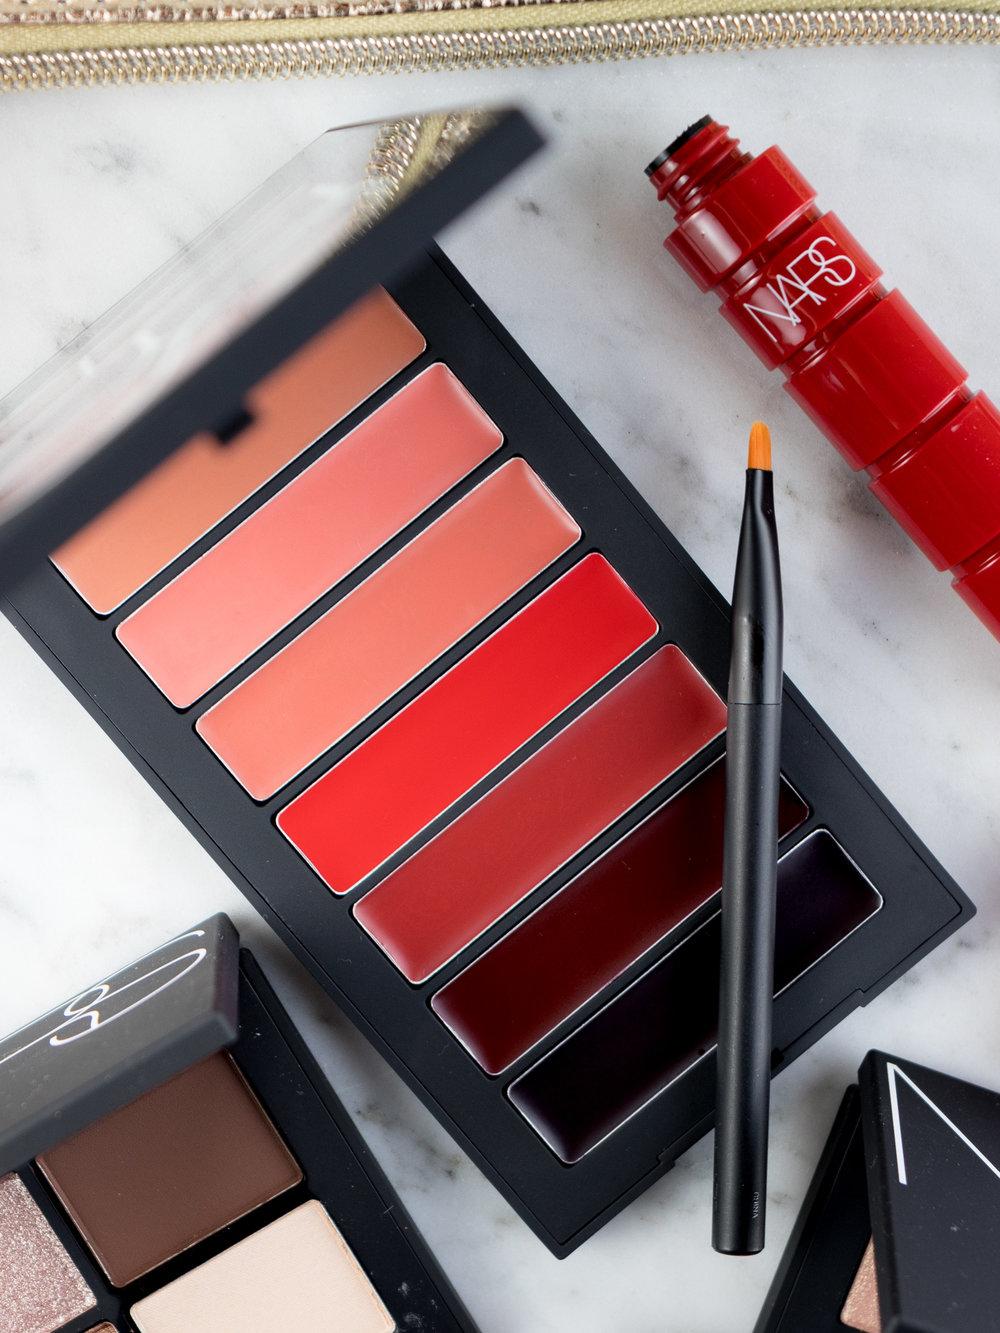 NARS 7 Deadly Sins Audacious Lipstick Palette